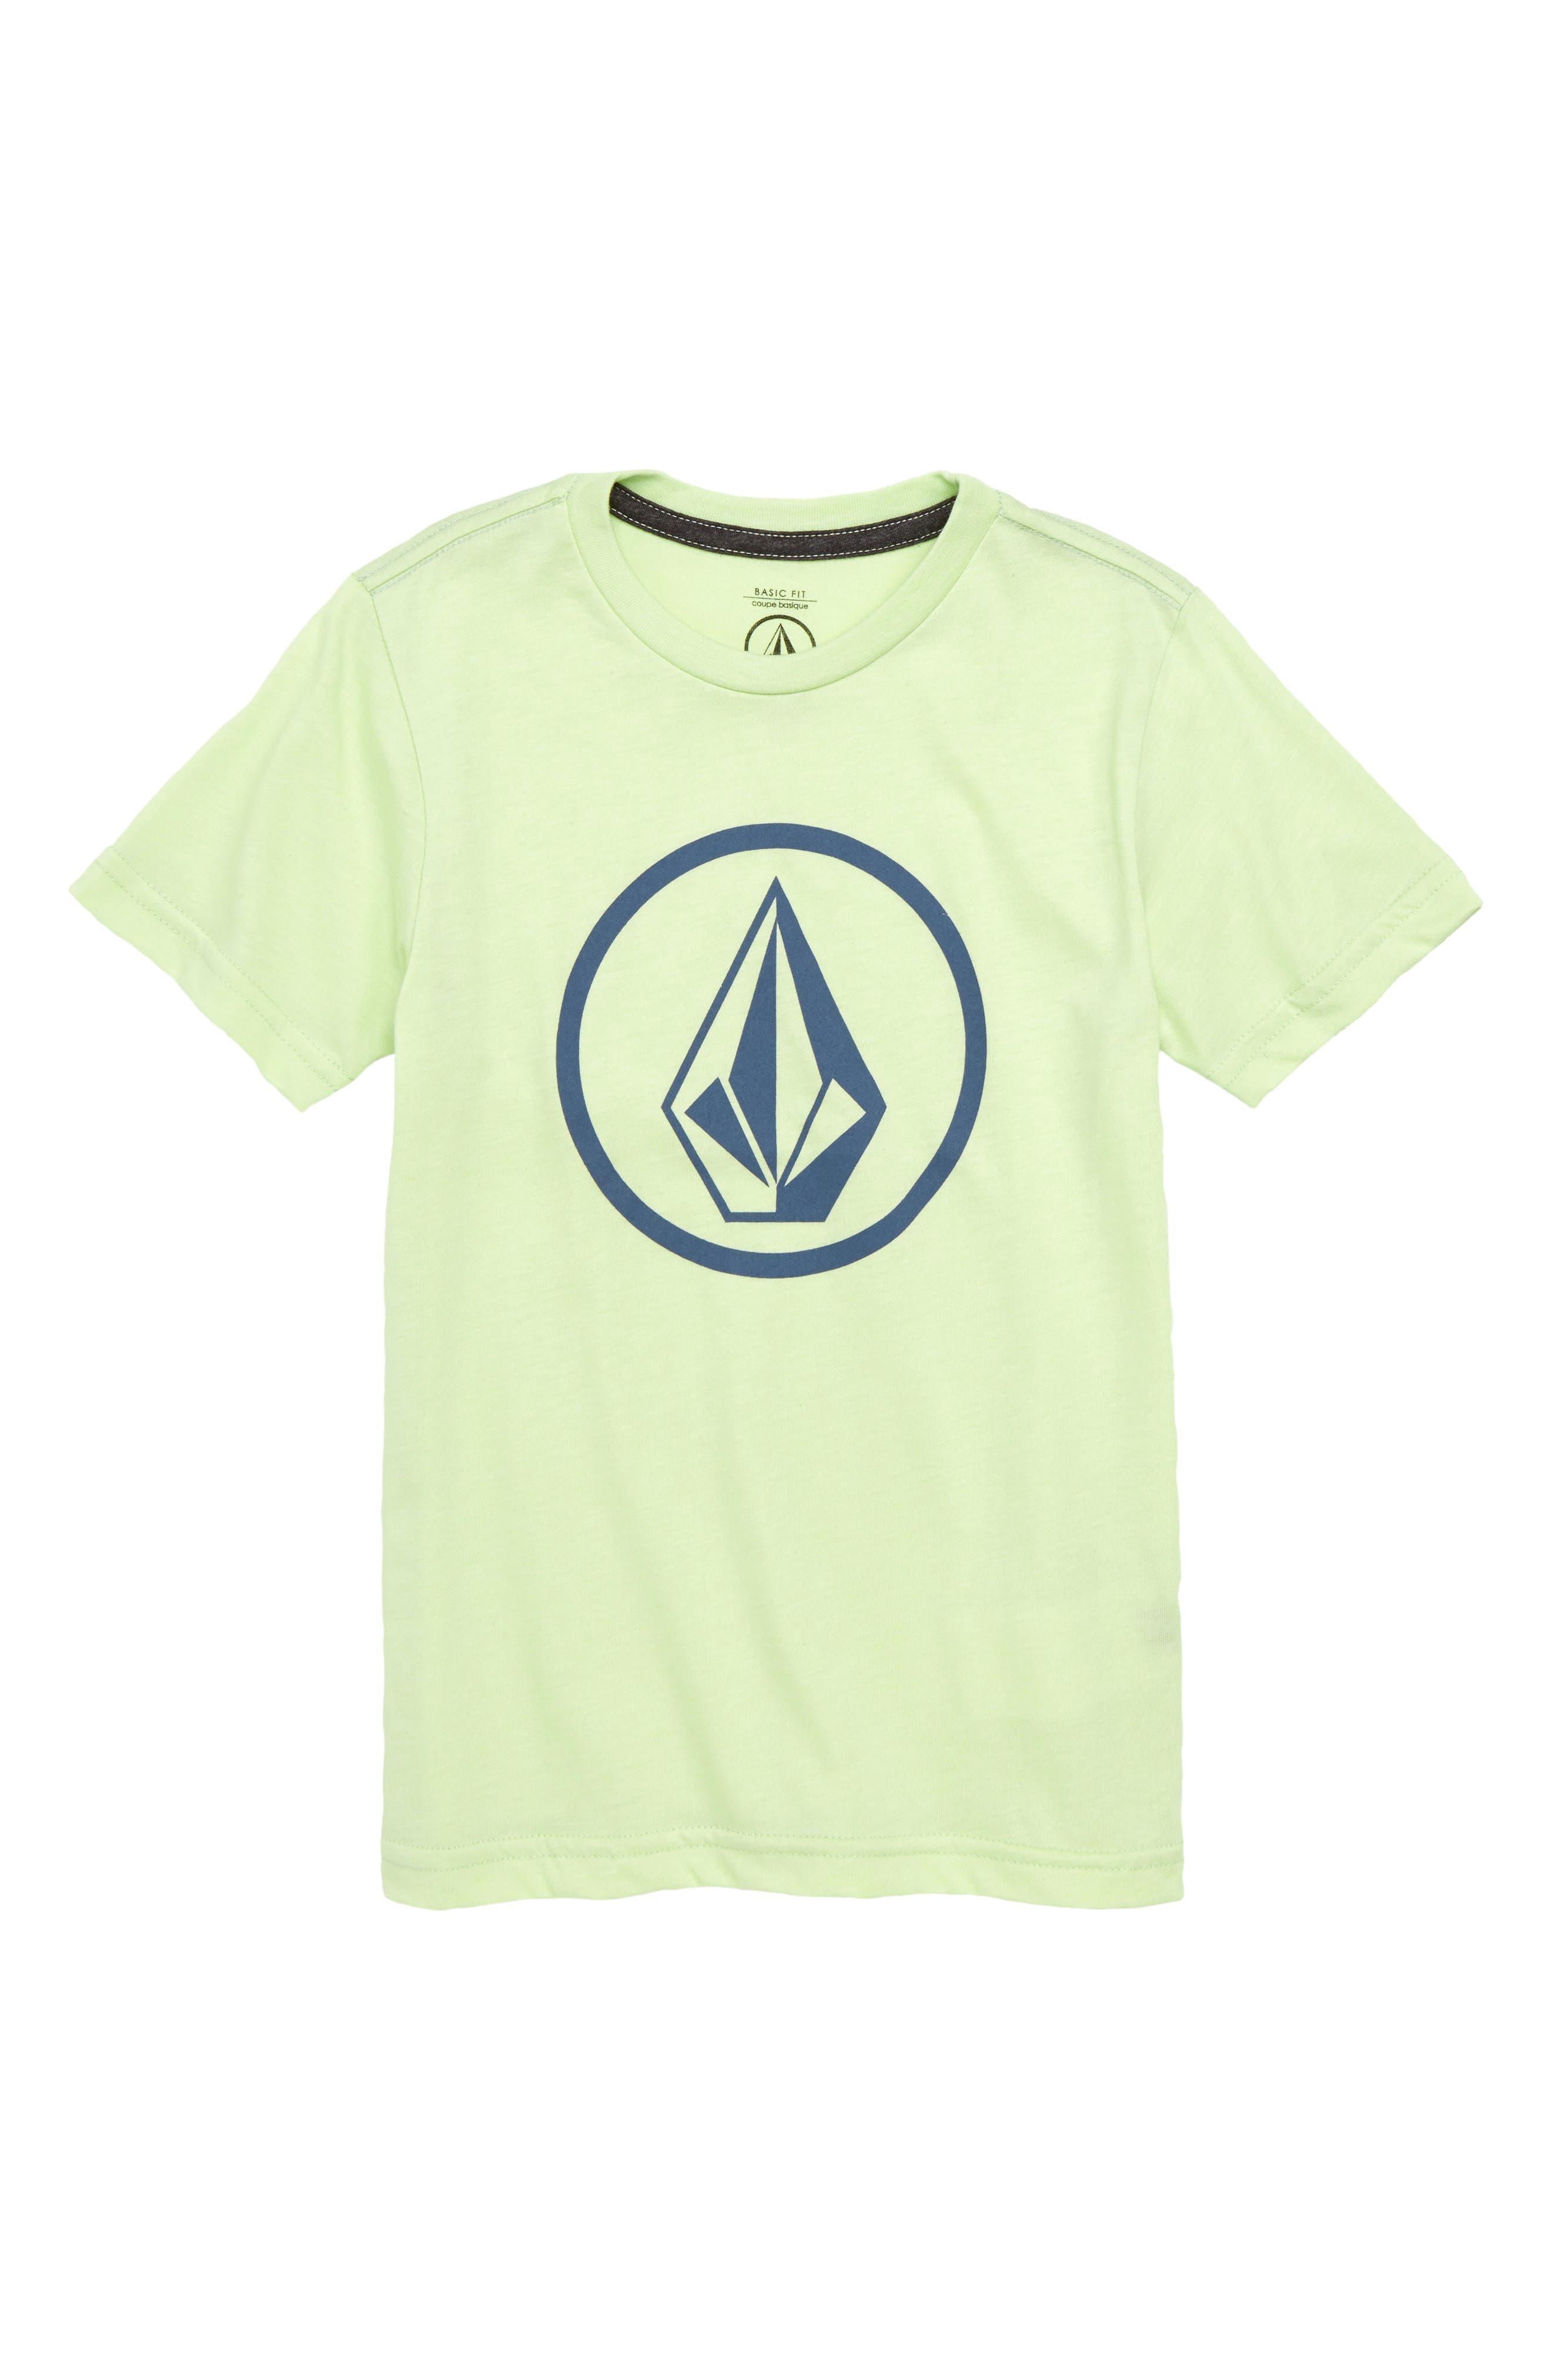 Circle Stone Logo Graphic T-Shirt,                             Main thumbnail 1, color,                             Mist Green